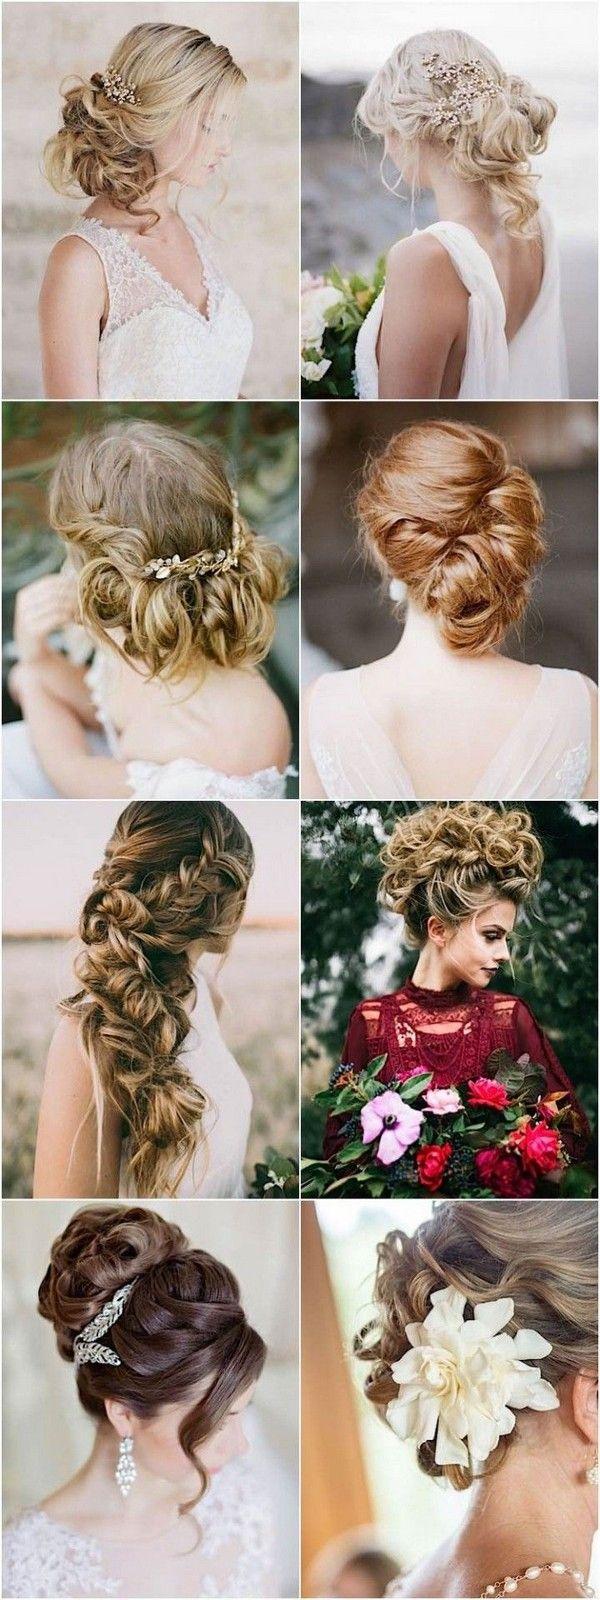 Superb Modern Glamorous Long Wedding Hairstyles / Http://www.himisspuff.com/bridal  Wedding Hairstyles For Long Hair/12/